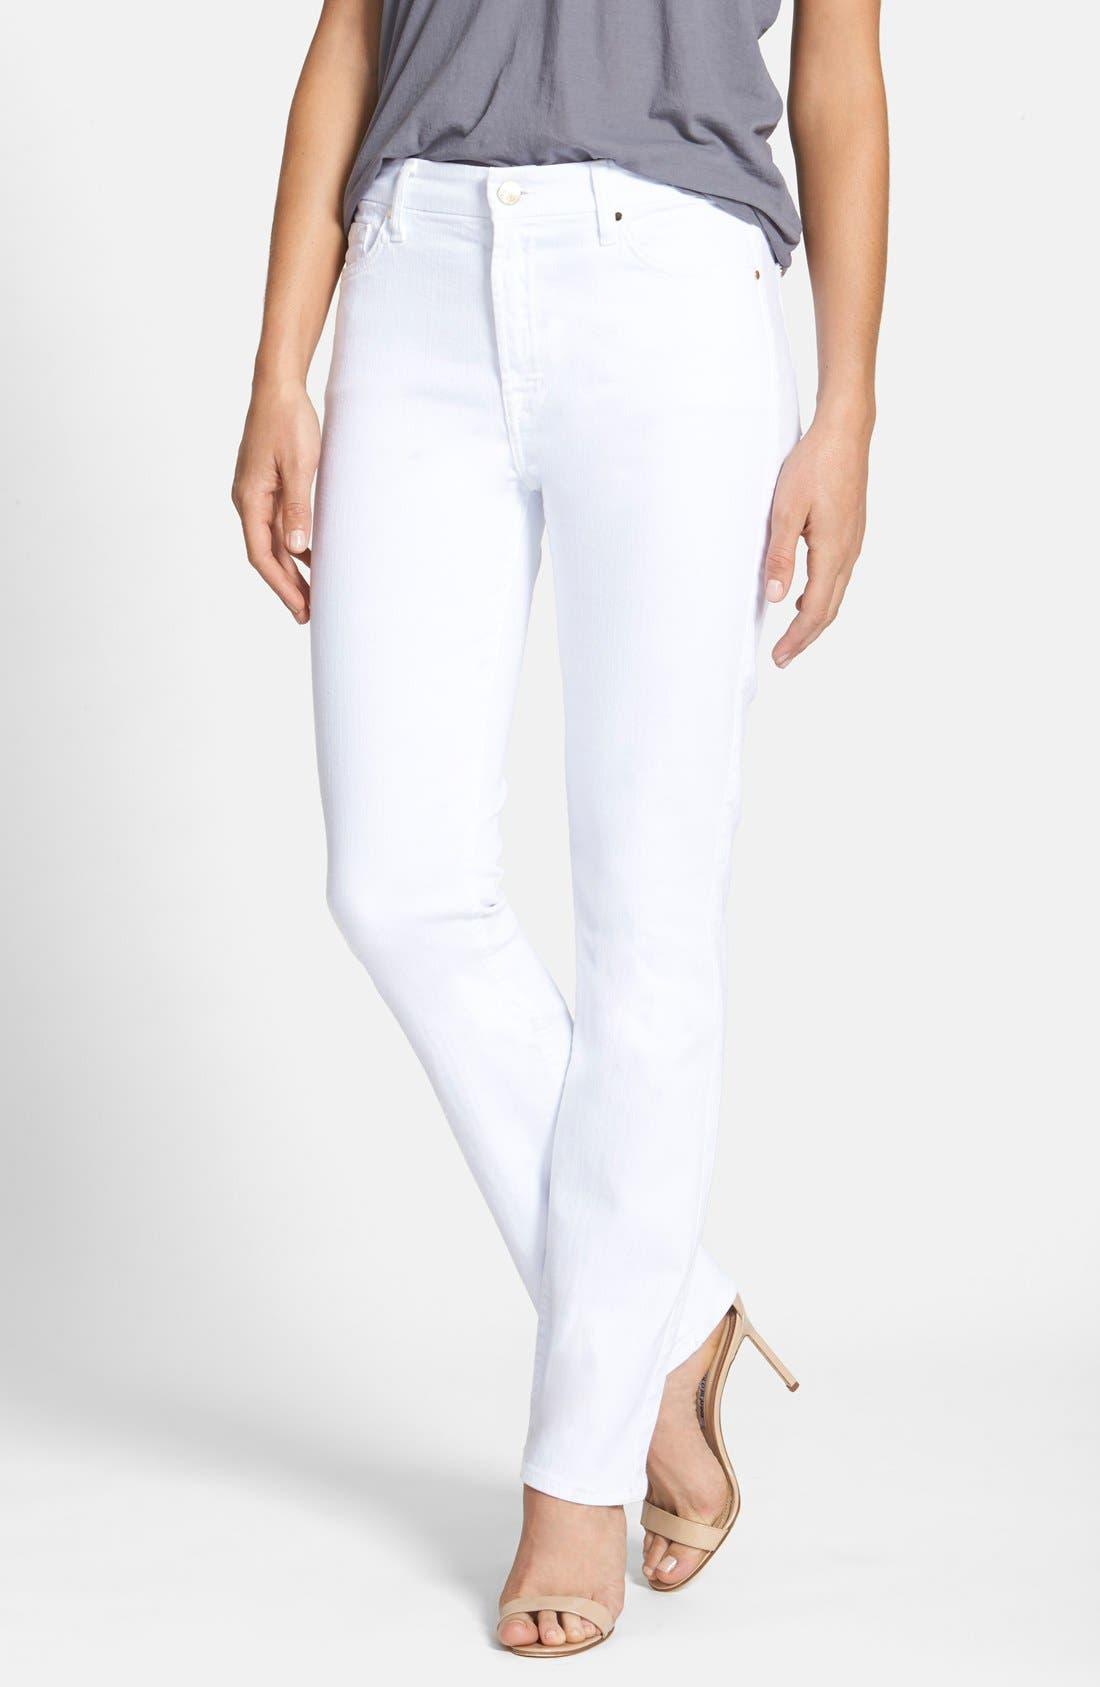 Alternate Image 1 Selected - Jen7 Stretch Slim Straight Leg Jeans (White Denim)